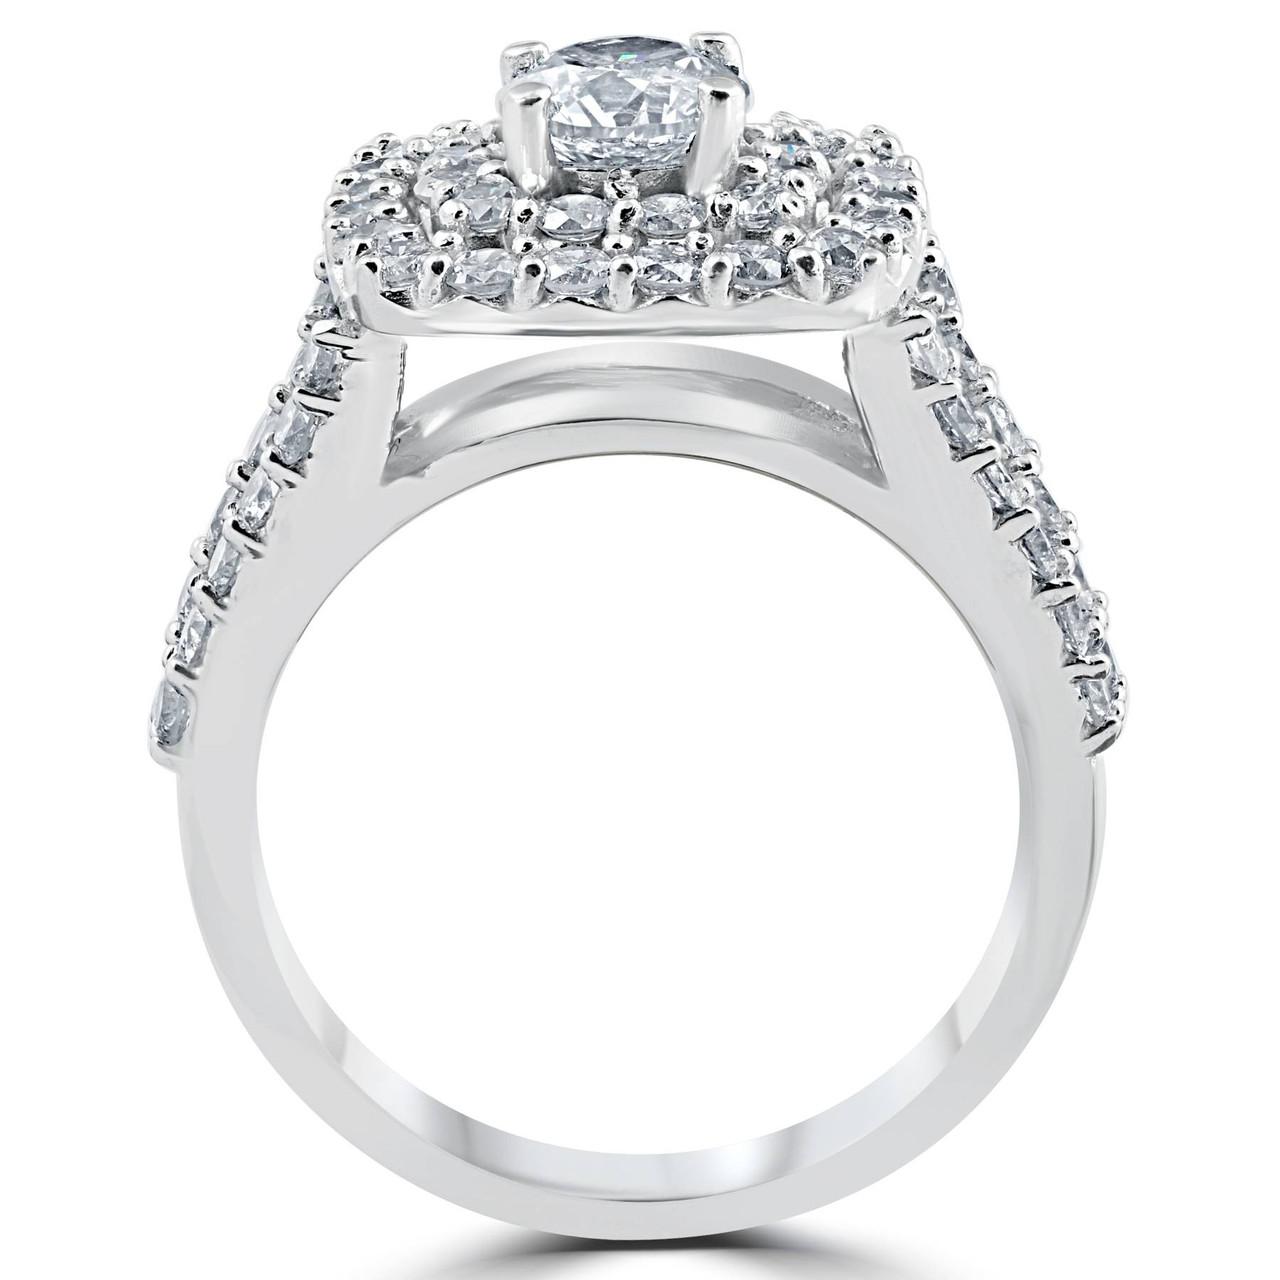 3 ct diamond engagement